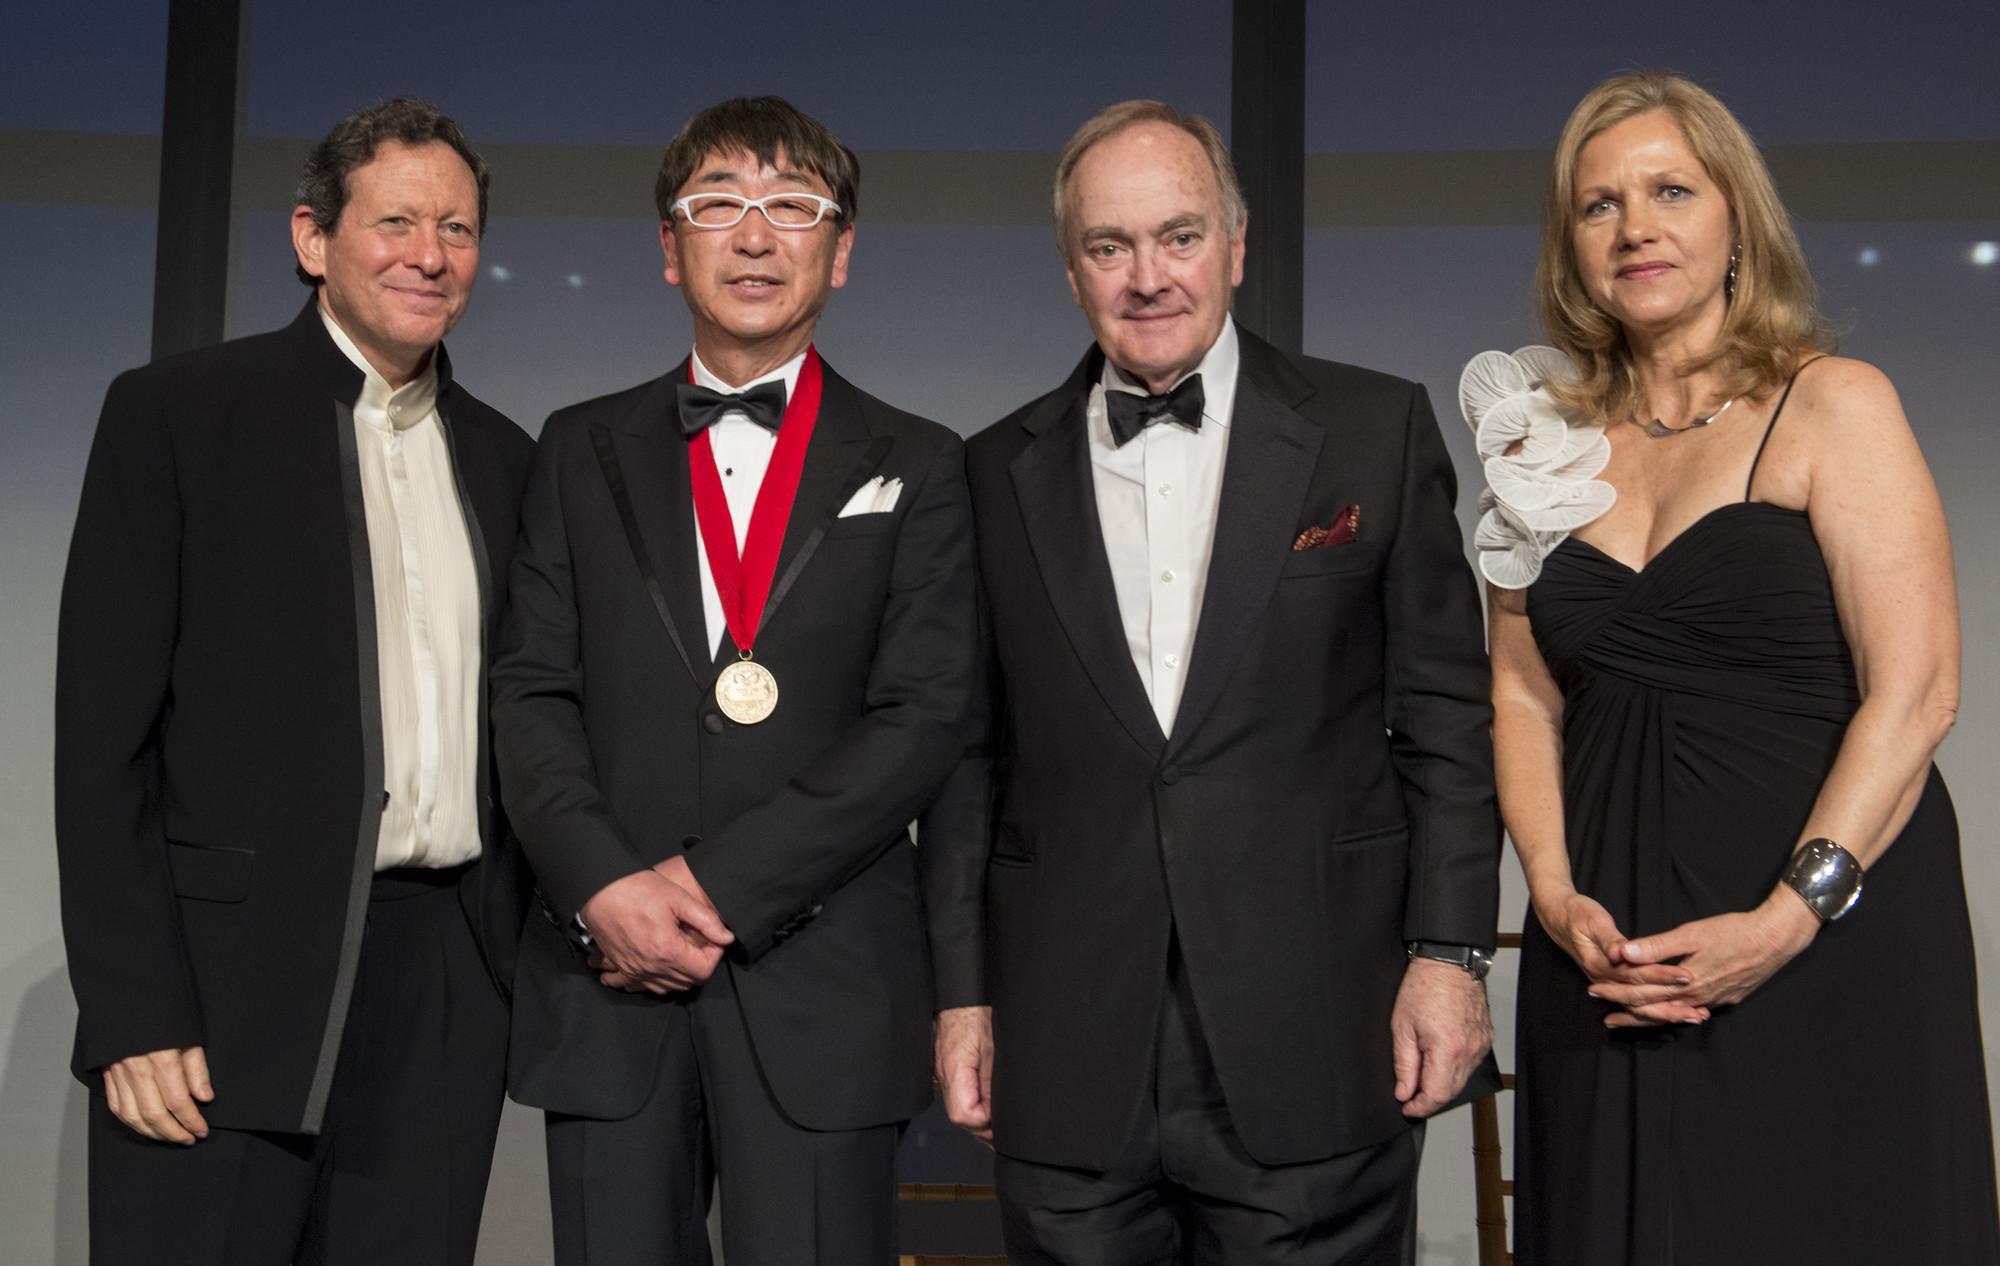 2013 Pritzker Prize Ceremony, Toyo Ito, Thomas Pritzker, Toyo Ito, Lord Palumbo, Martha Thorn